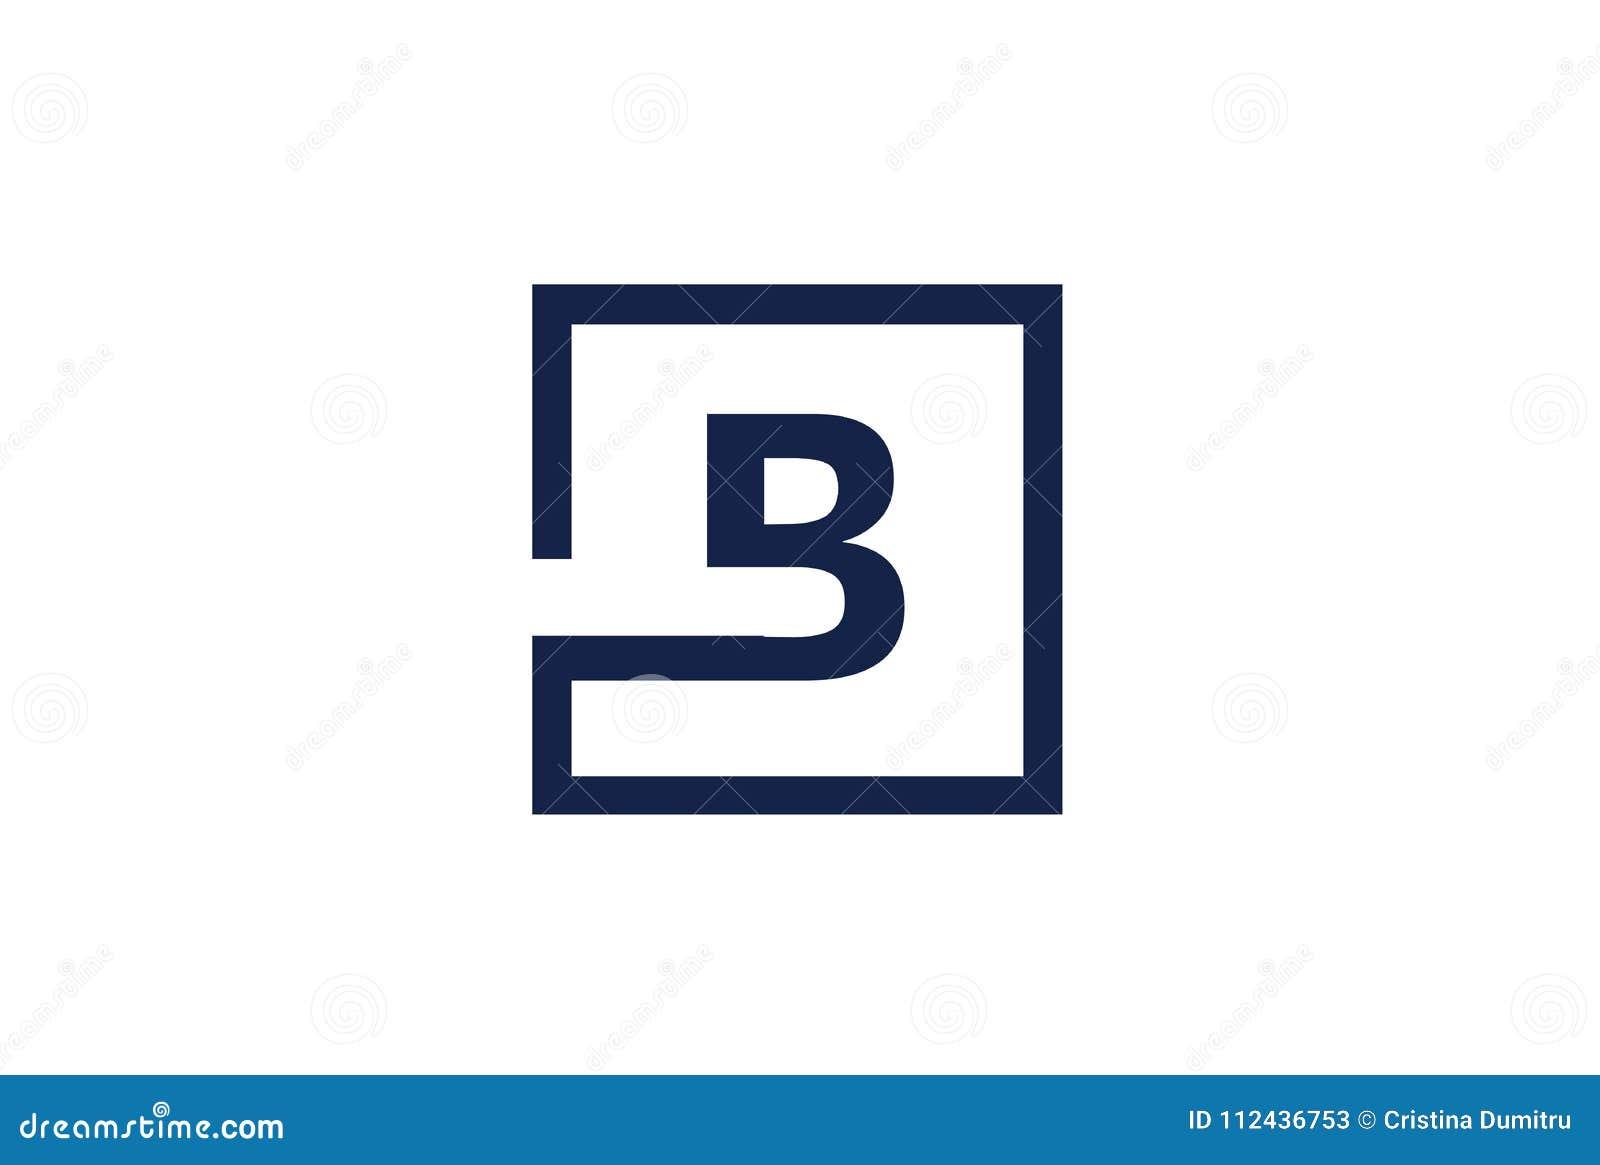 B Logo b logo design design concept element stock vector - illustration of